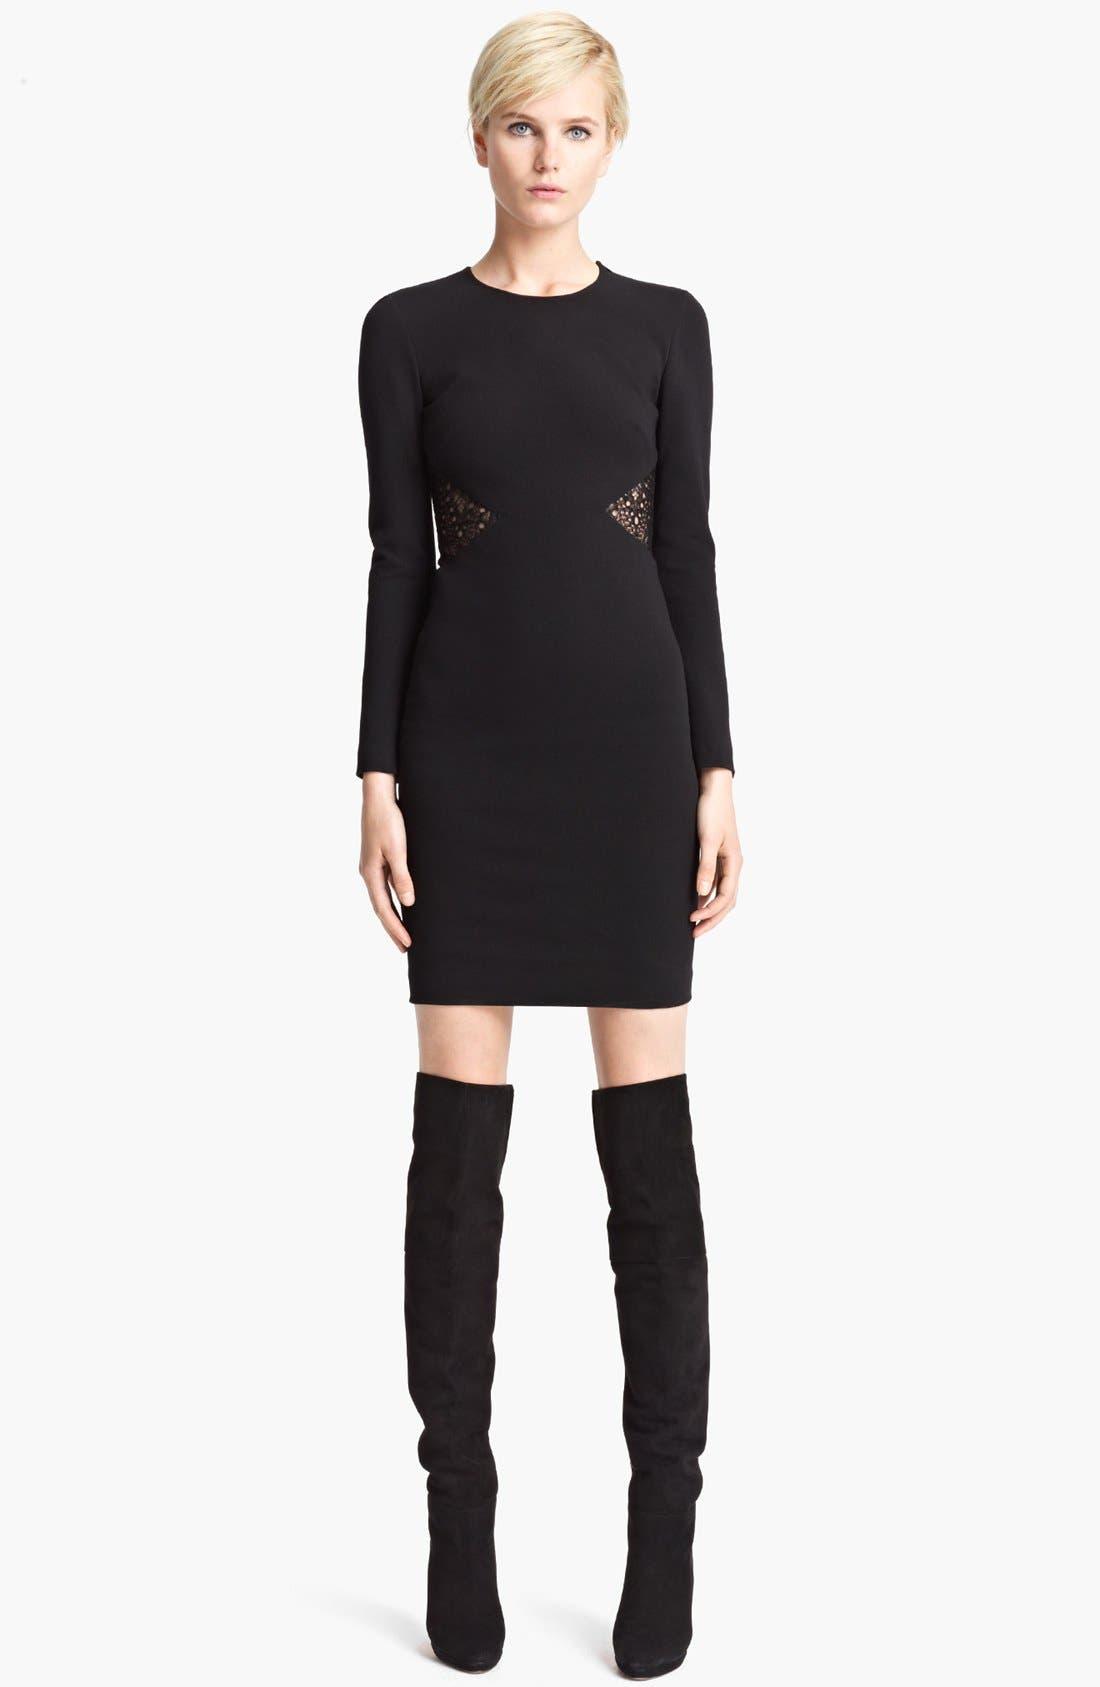 Main Image - Emilio Pucci Dress & Accessories